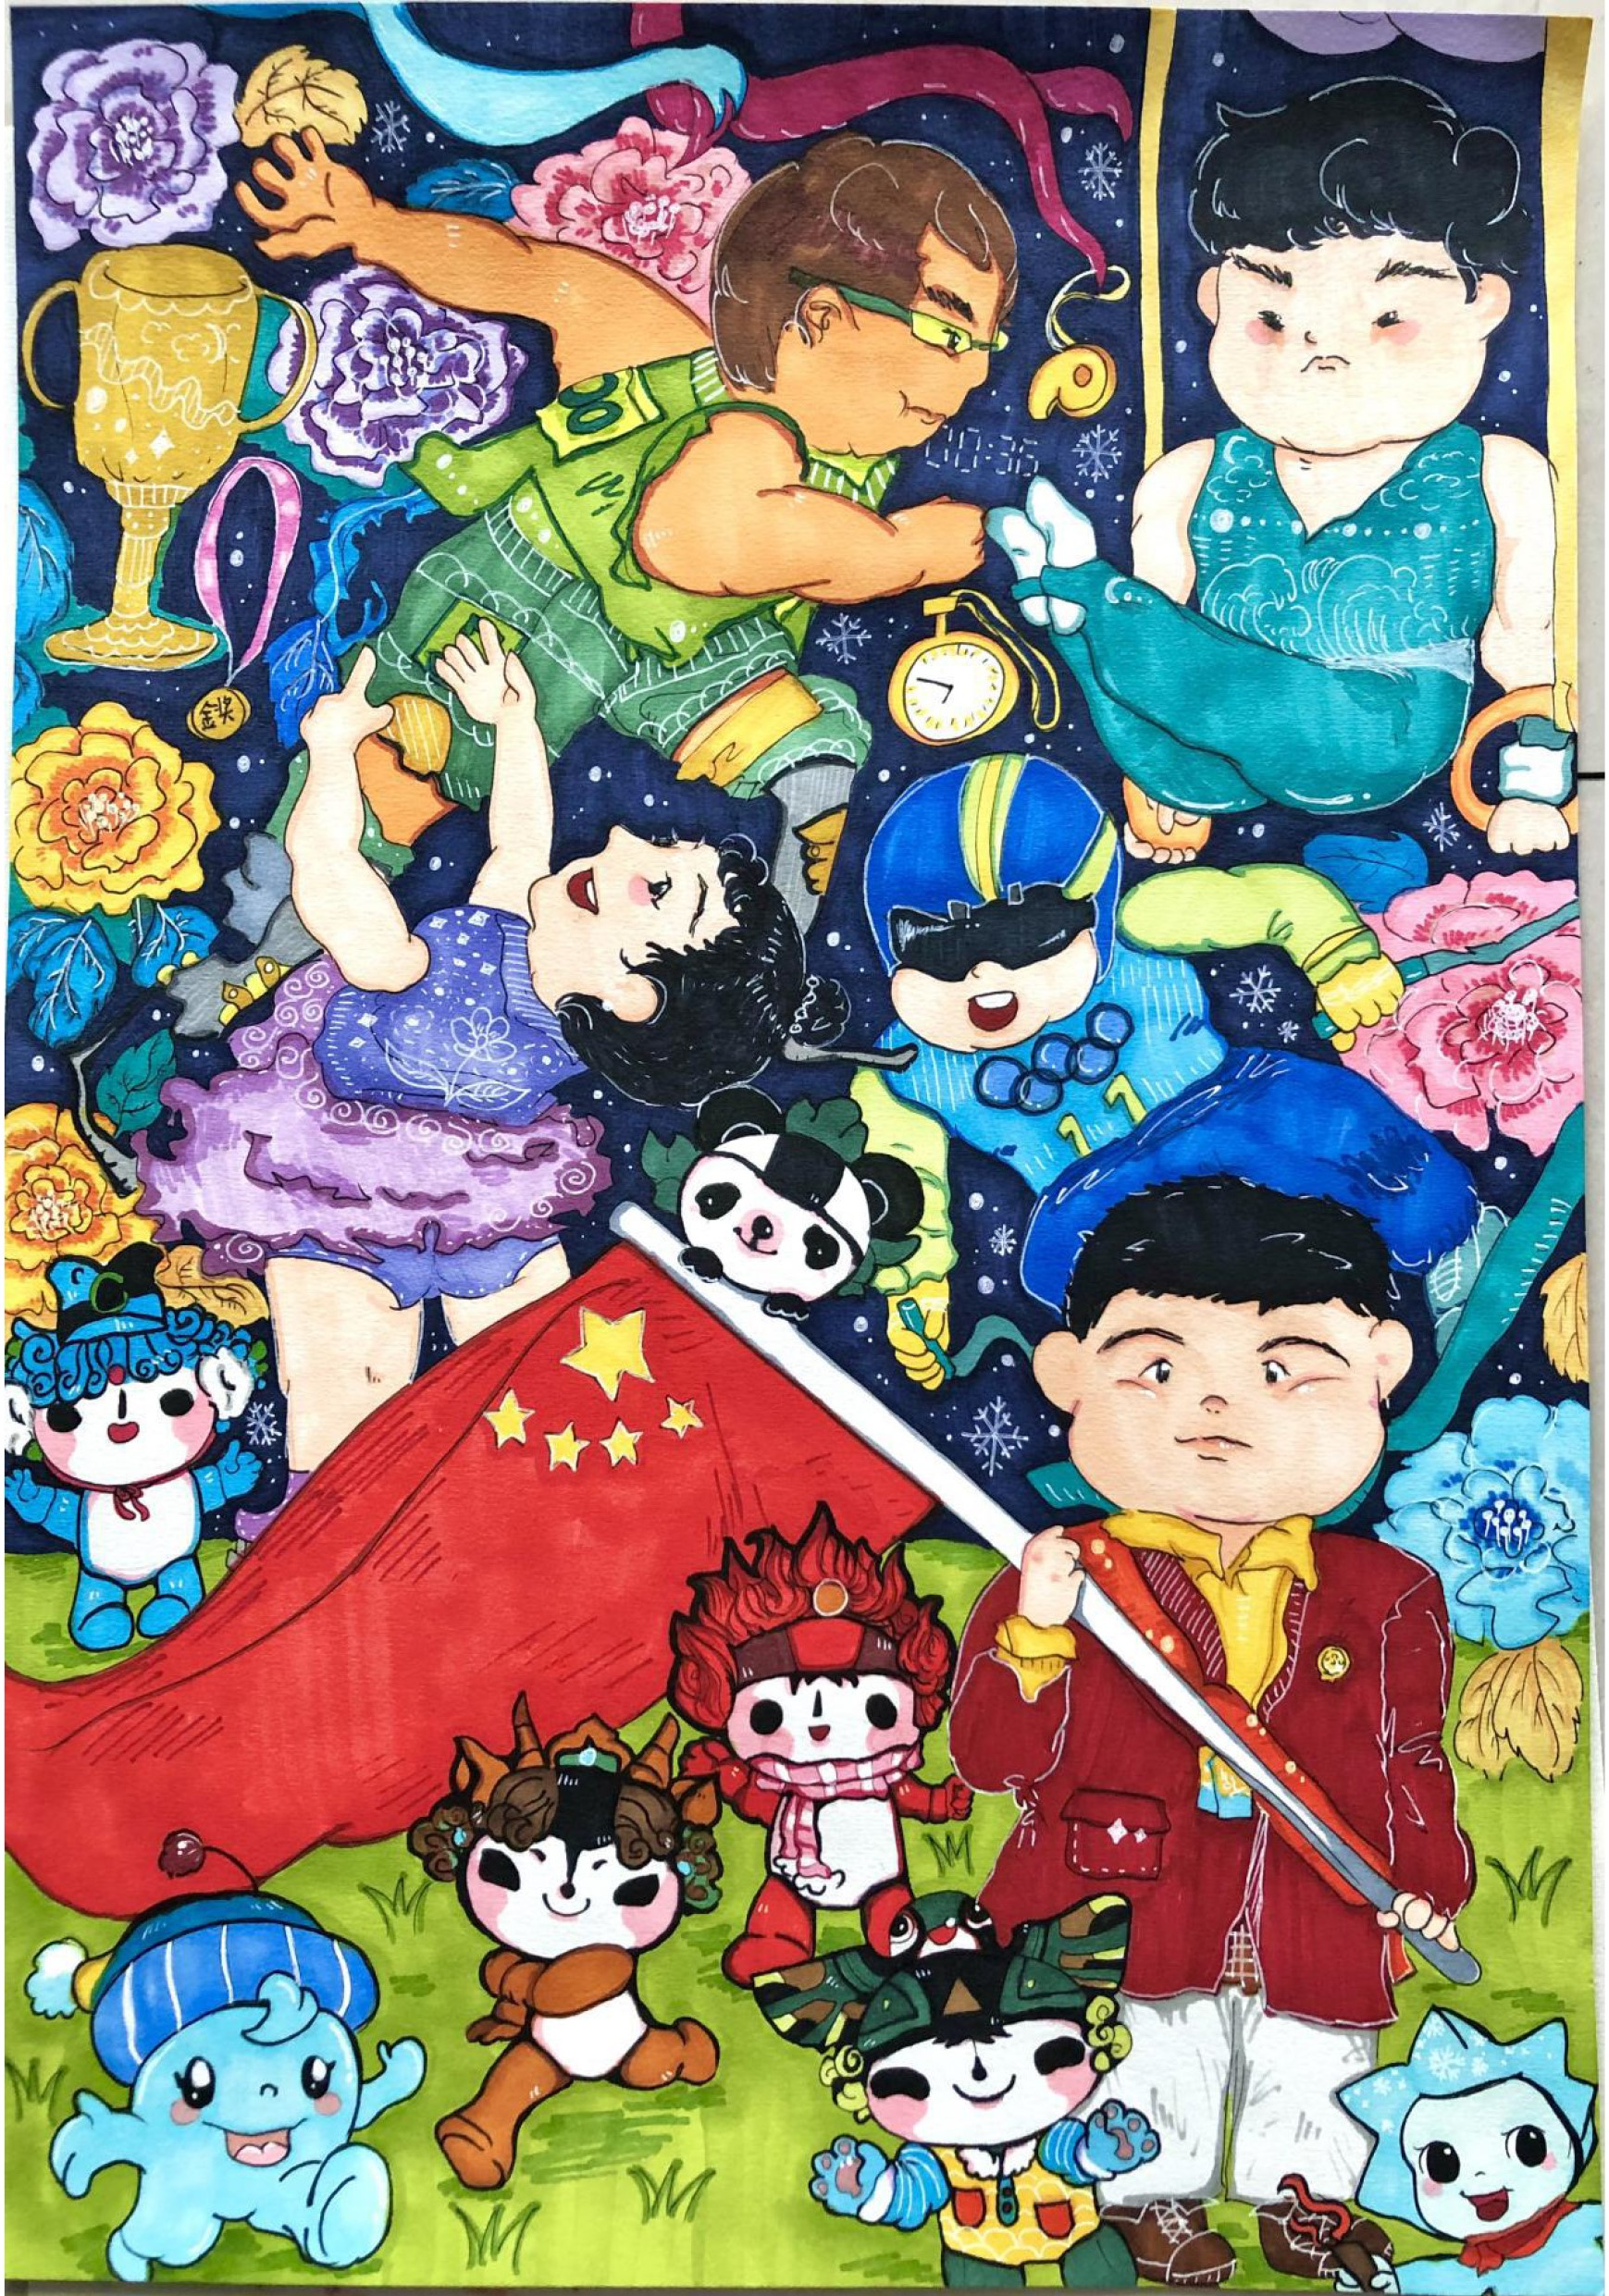 我心中的奥运 Olympics In My Heart 曾炜家 Zeng Weijia